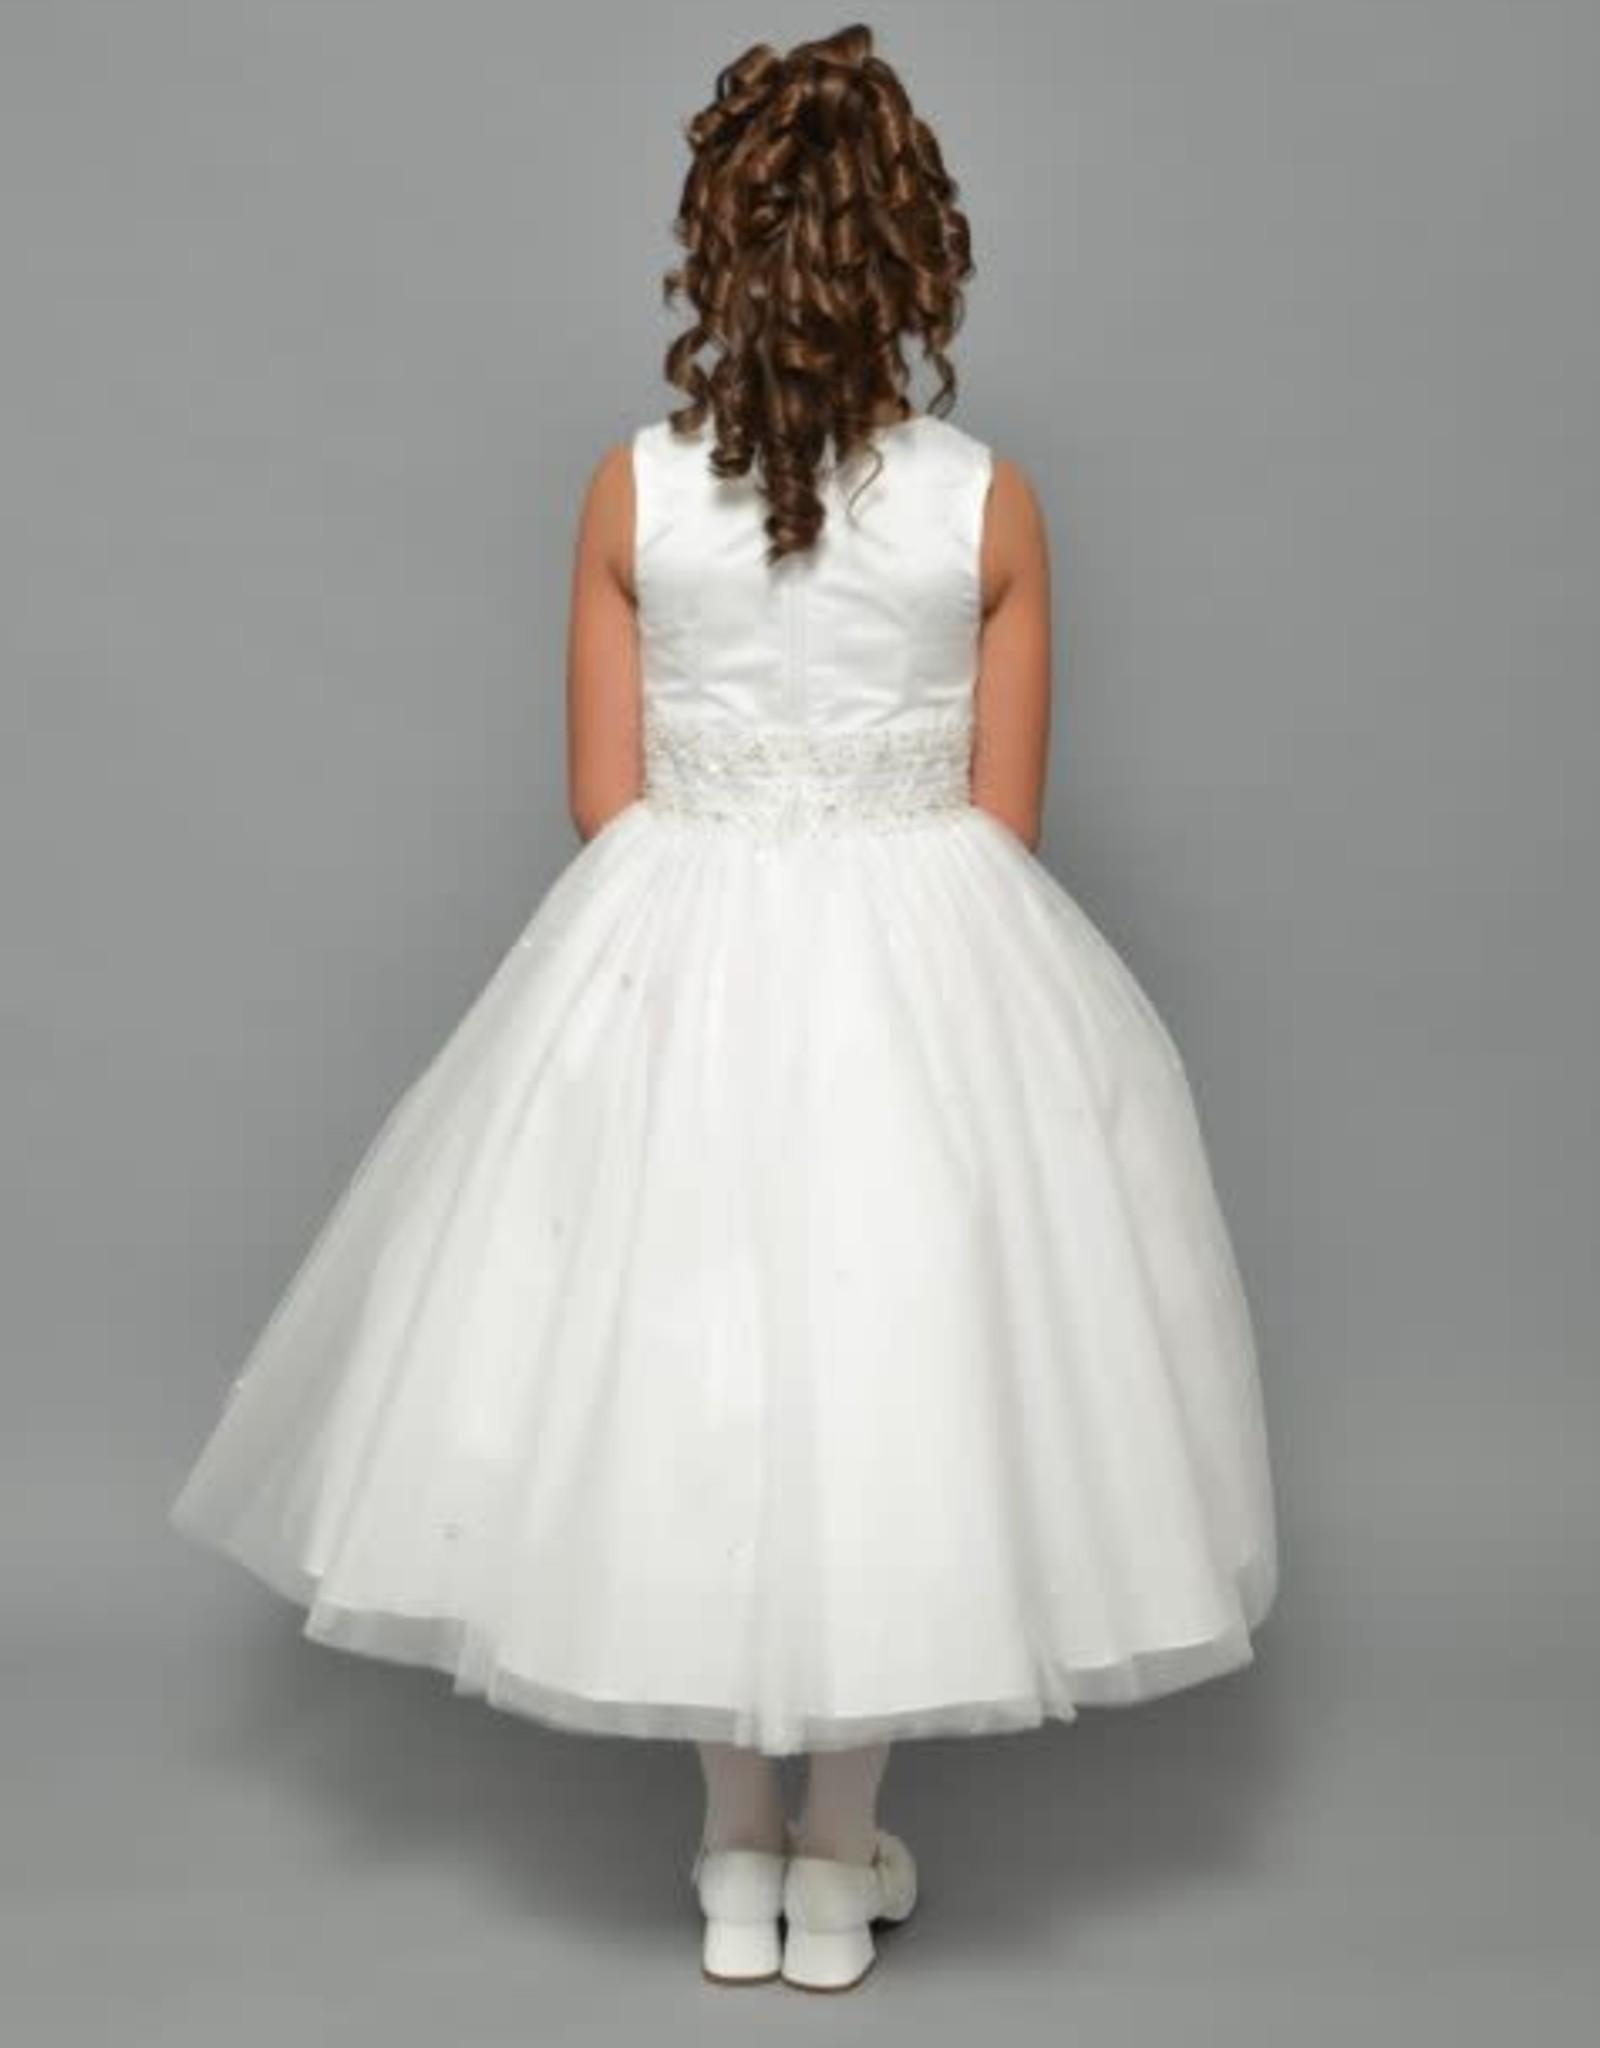 Sweetie Pie Dress 494